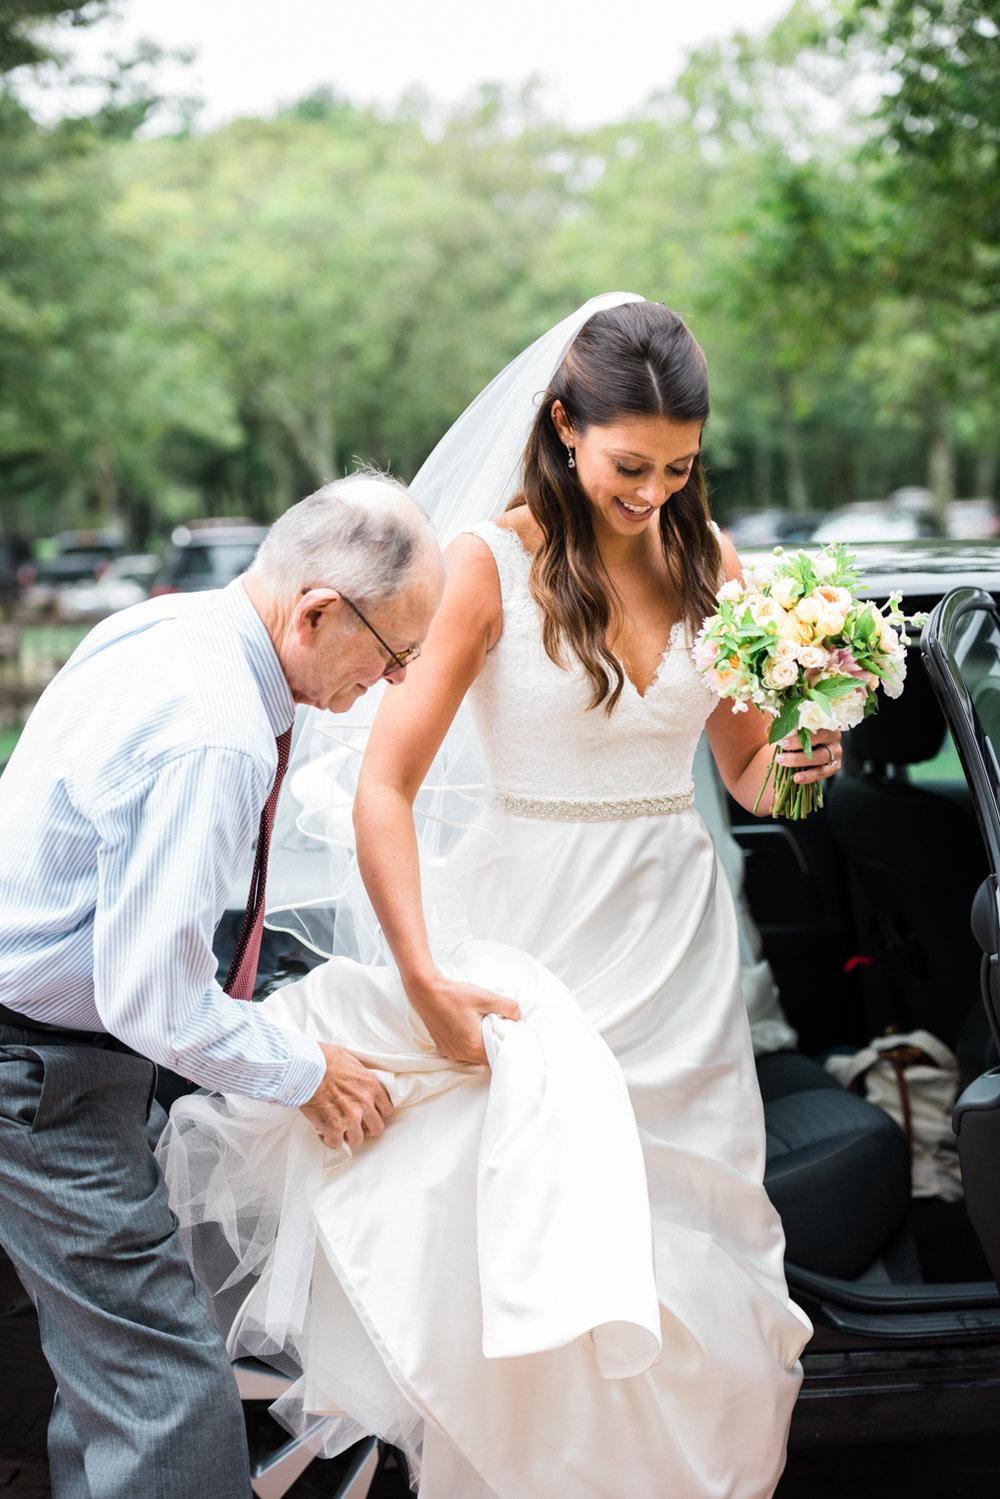 maureen_evan_wedding_marthas_vineyard-8488.jpg